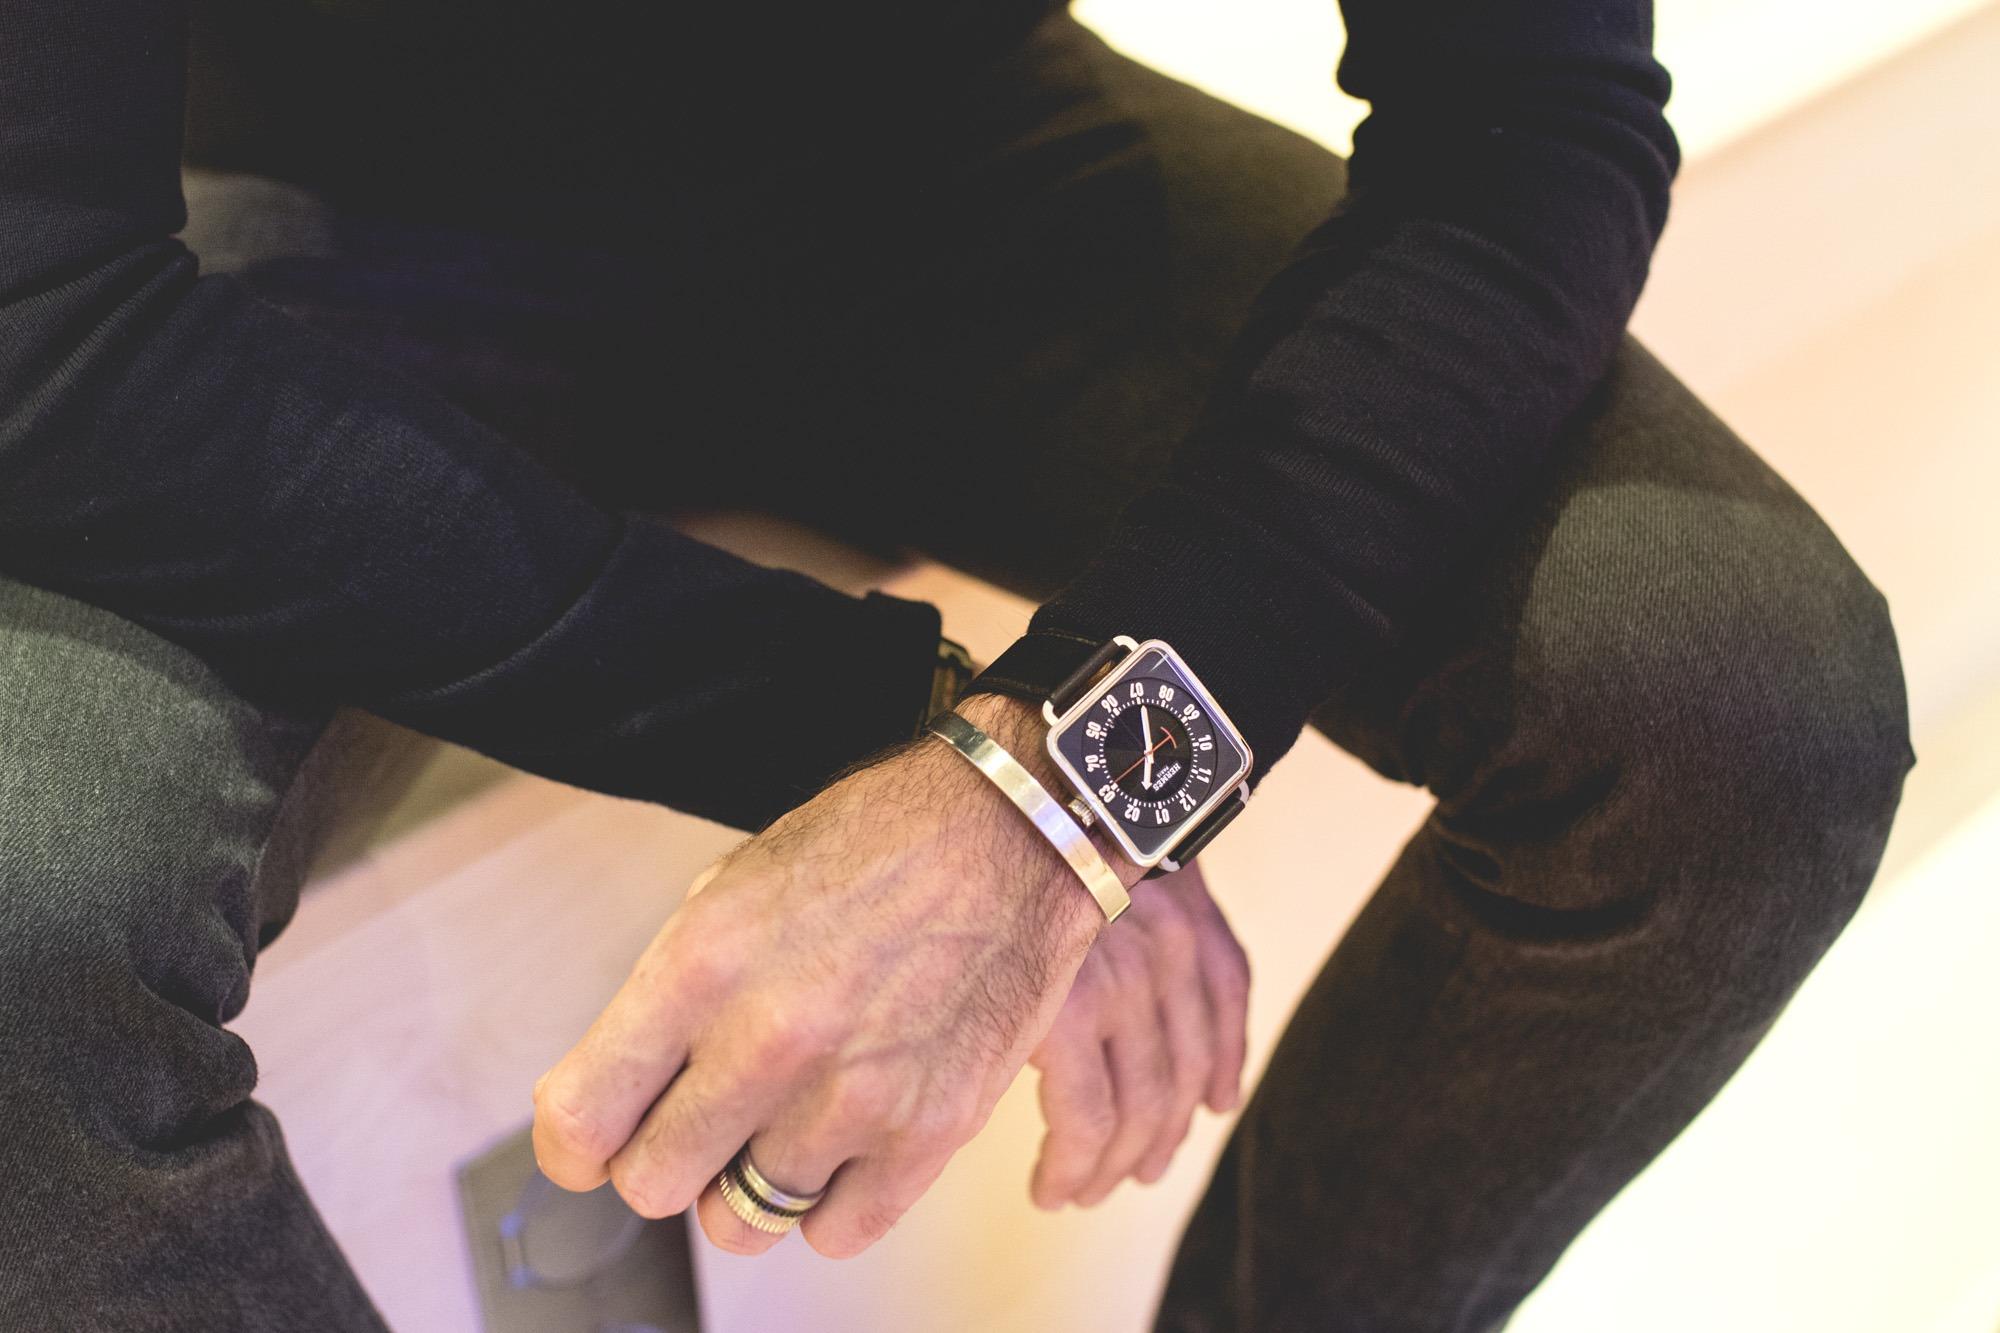 Hermès SIHH 2018 - Carré H cadran noir